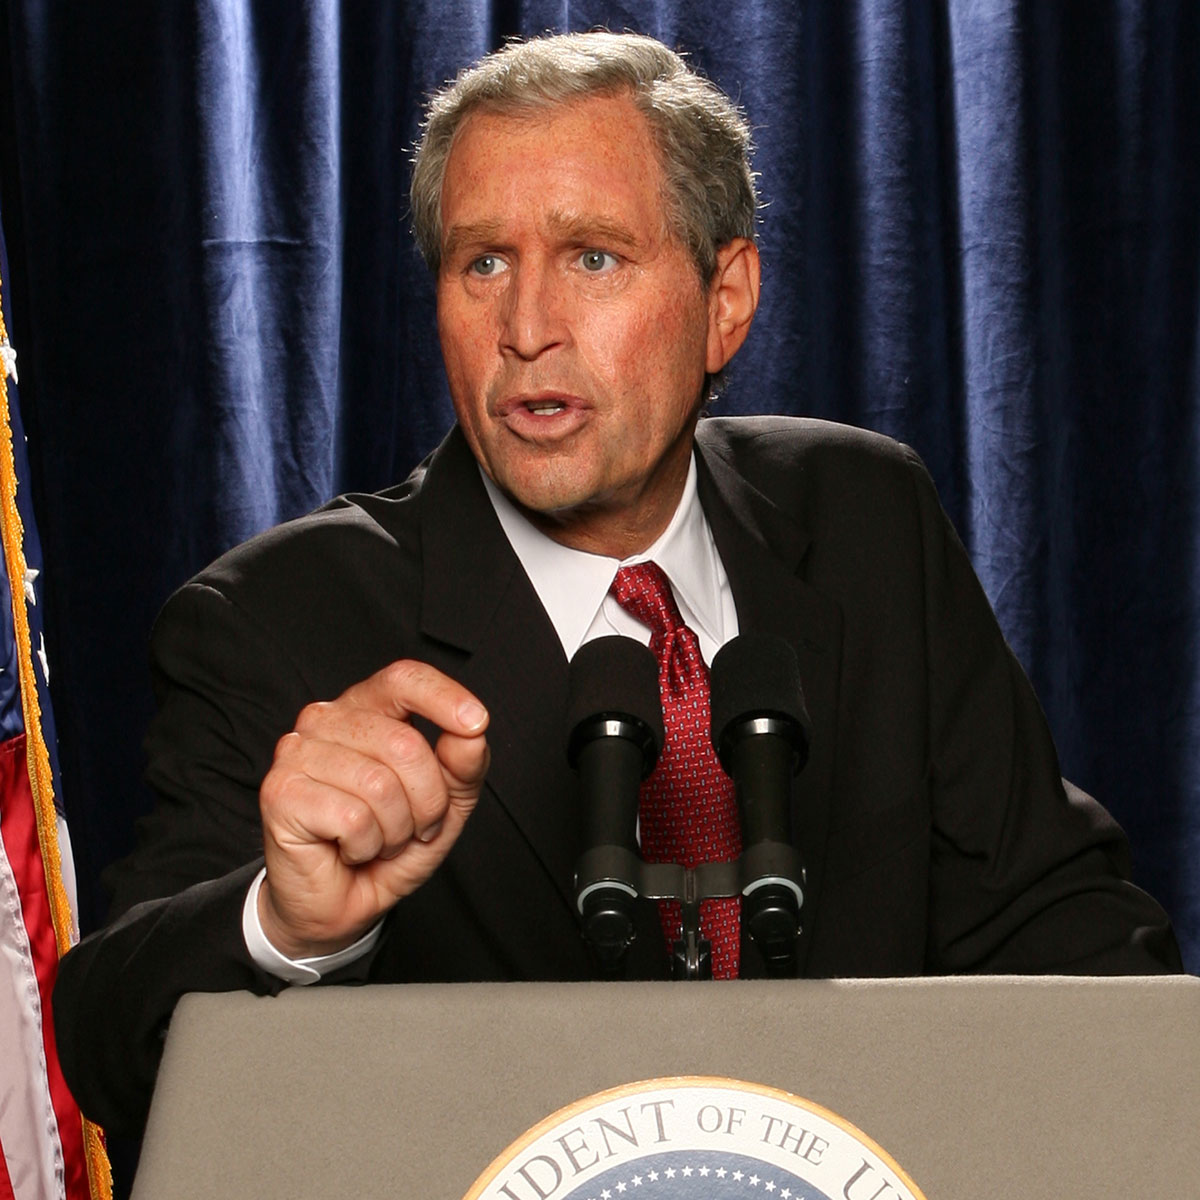 Steve Bridges, George W. Bush